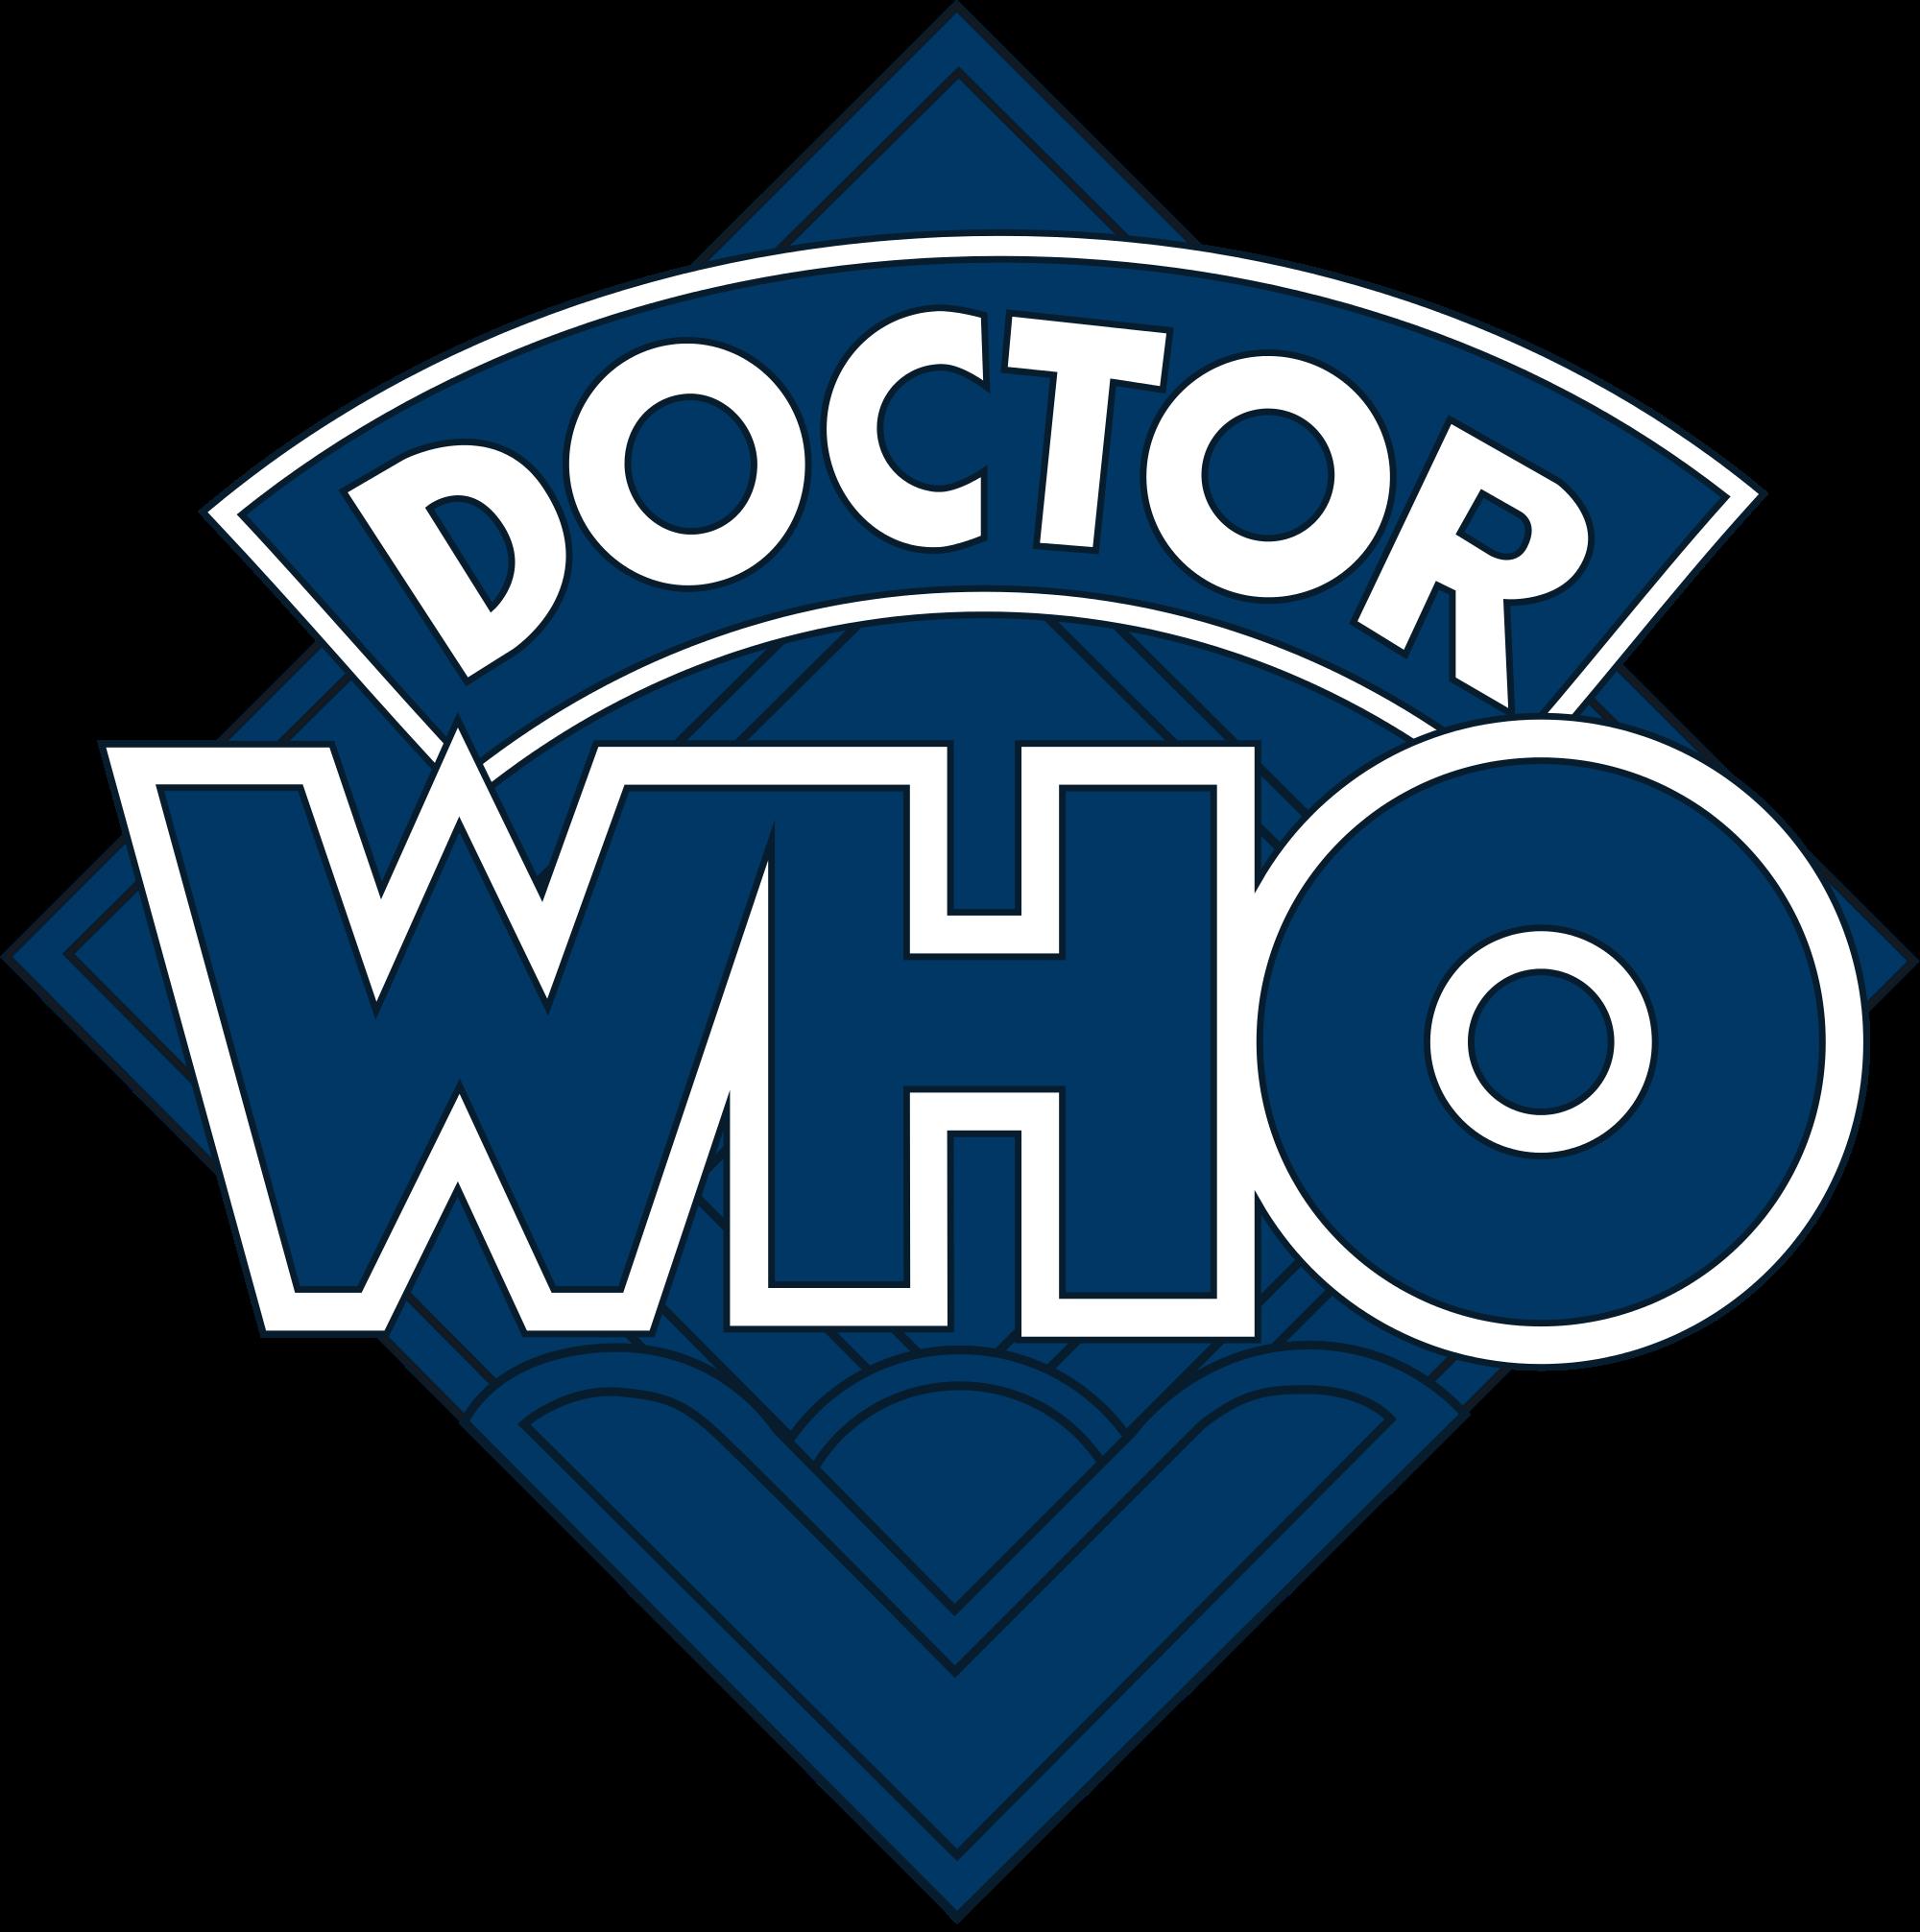 Doctor Who Season 15 Wikipedia The Free Encyclopedia Doctor Who Logo Doctor Who Logos